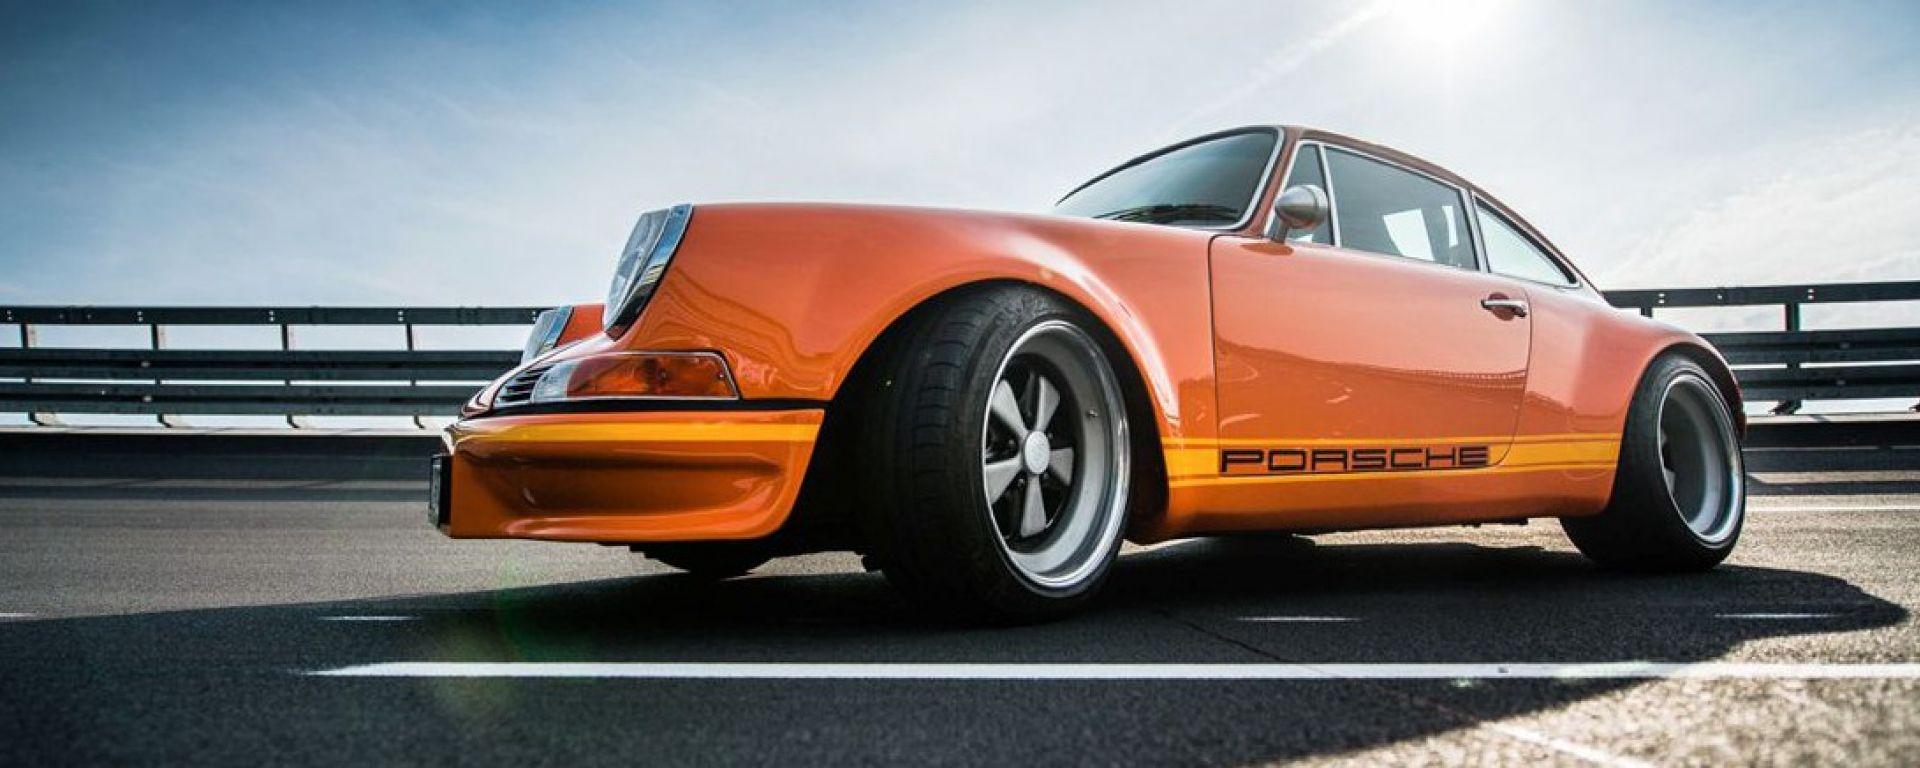 Lightspeed Classic 911